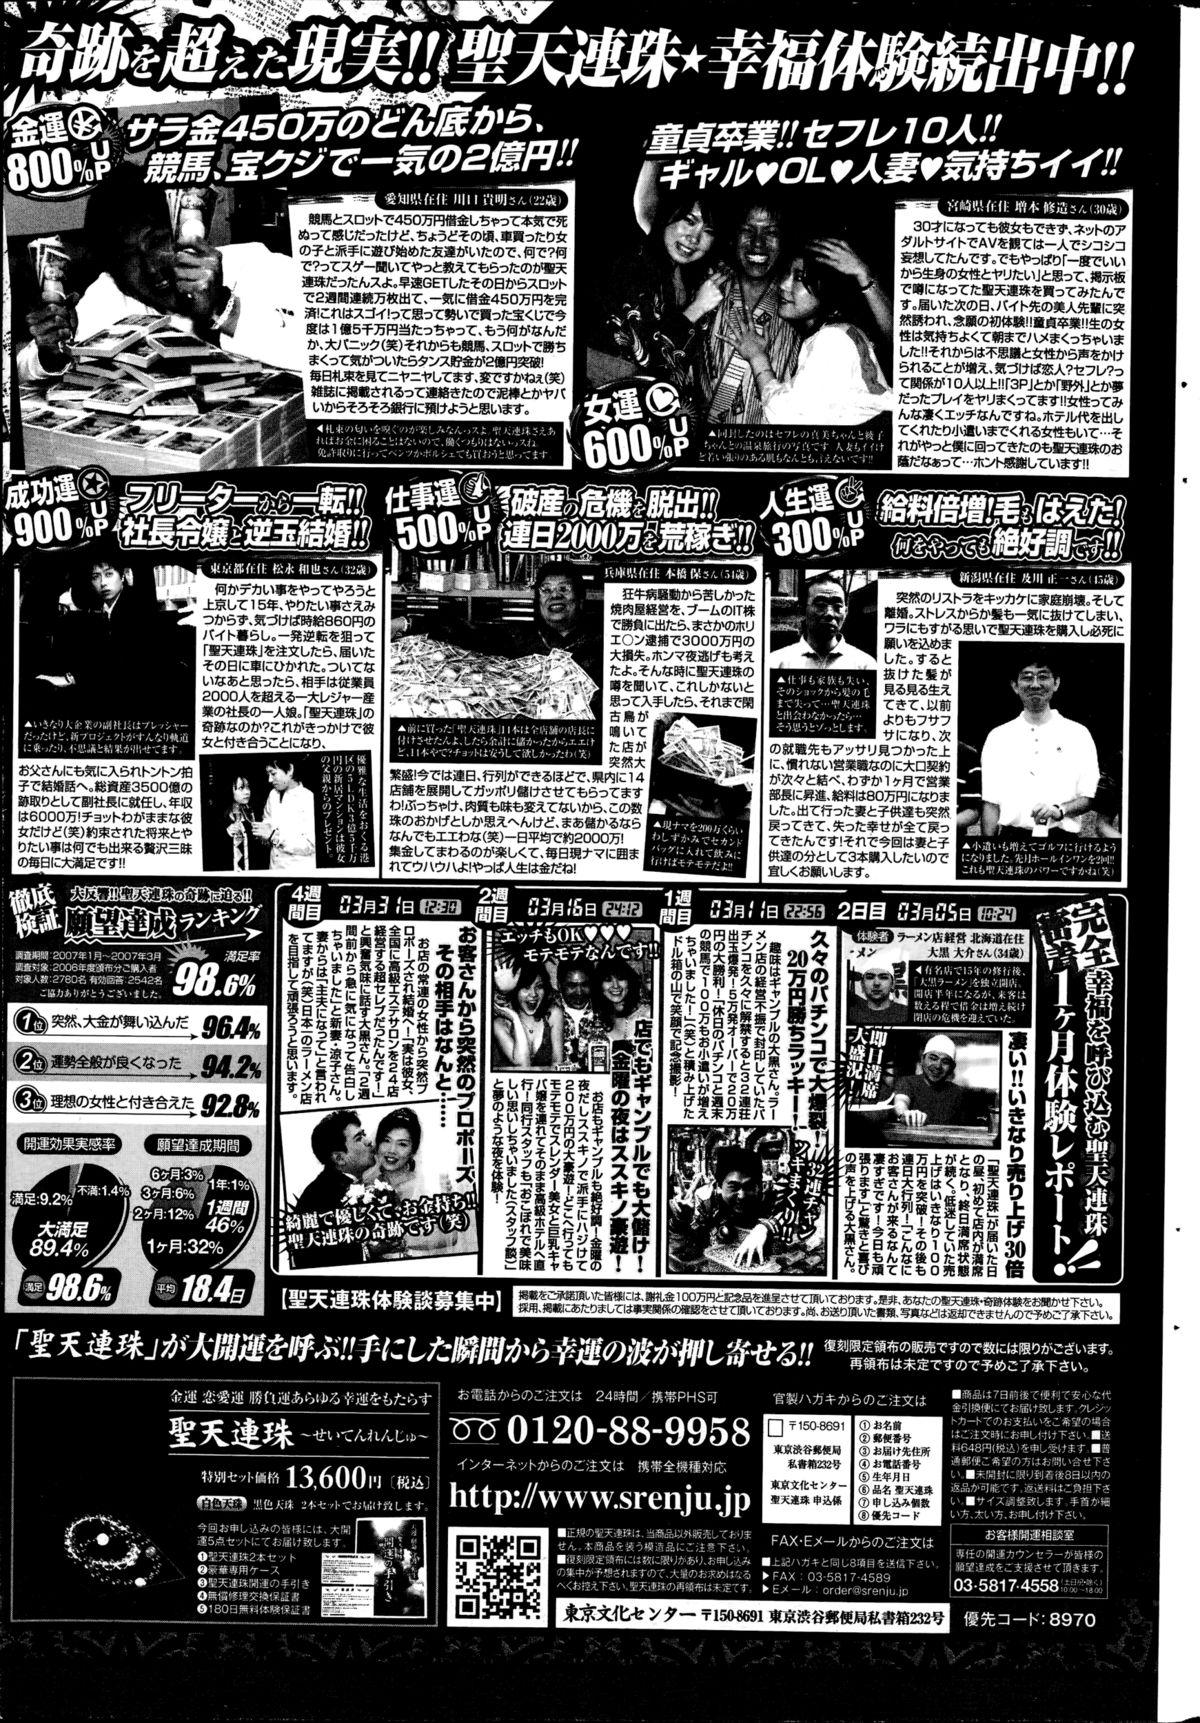 COMIC Penguin Club Sanzokuban 2014-11 232